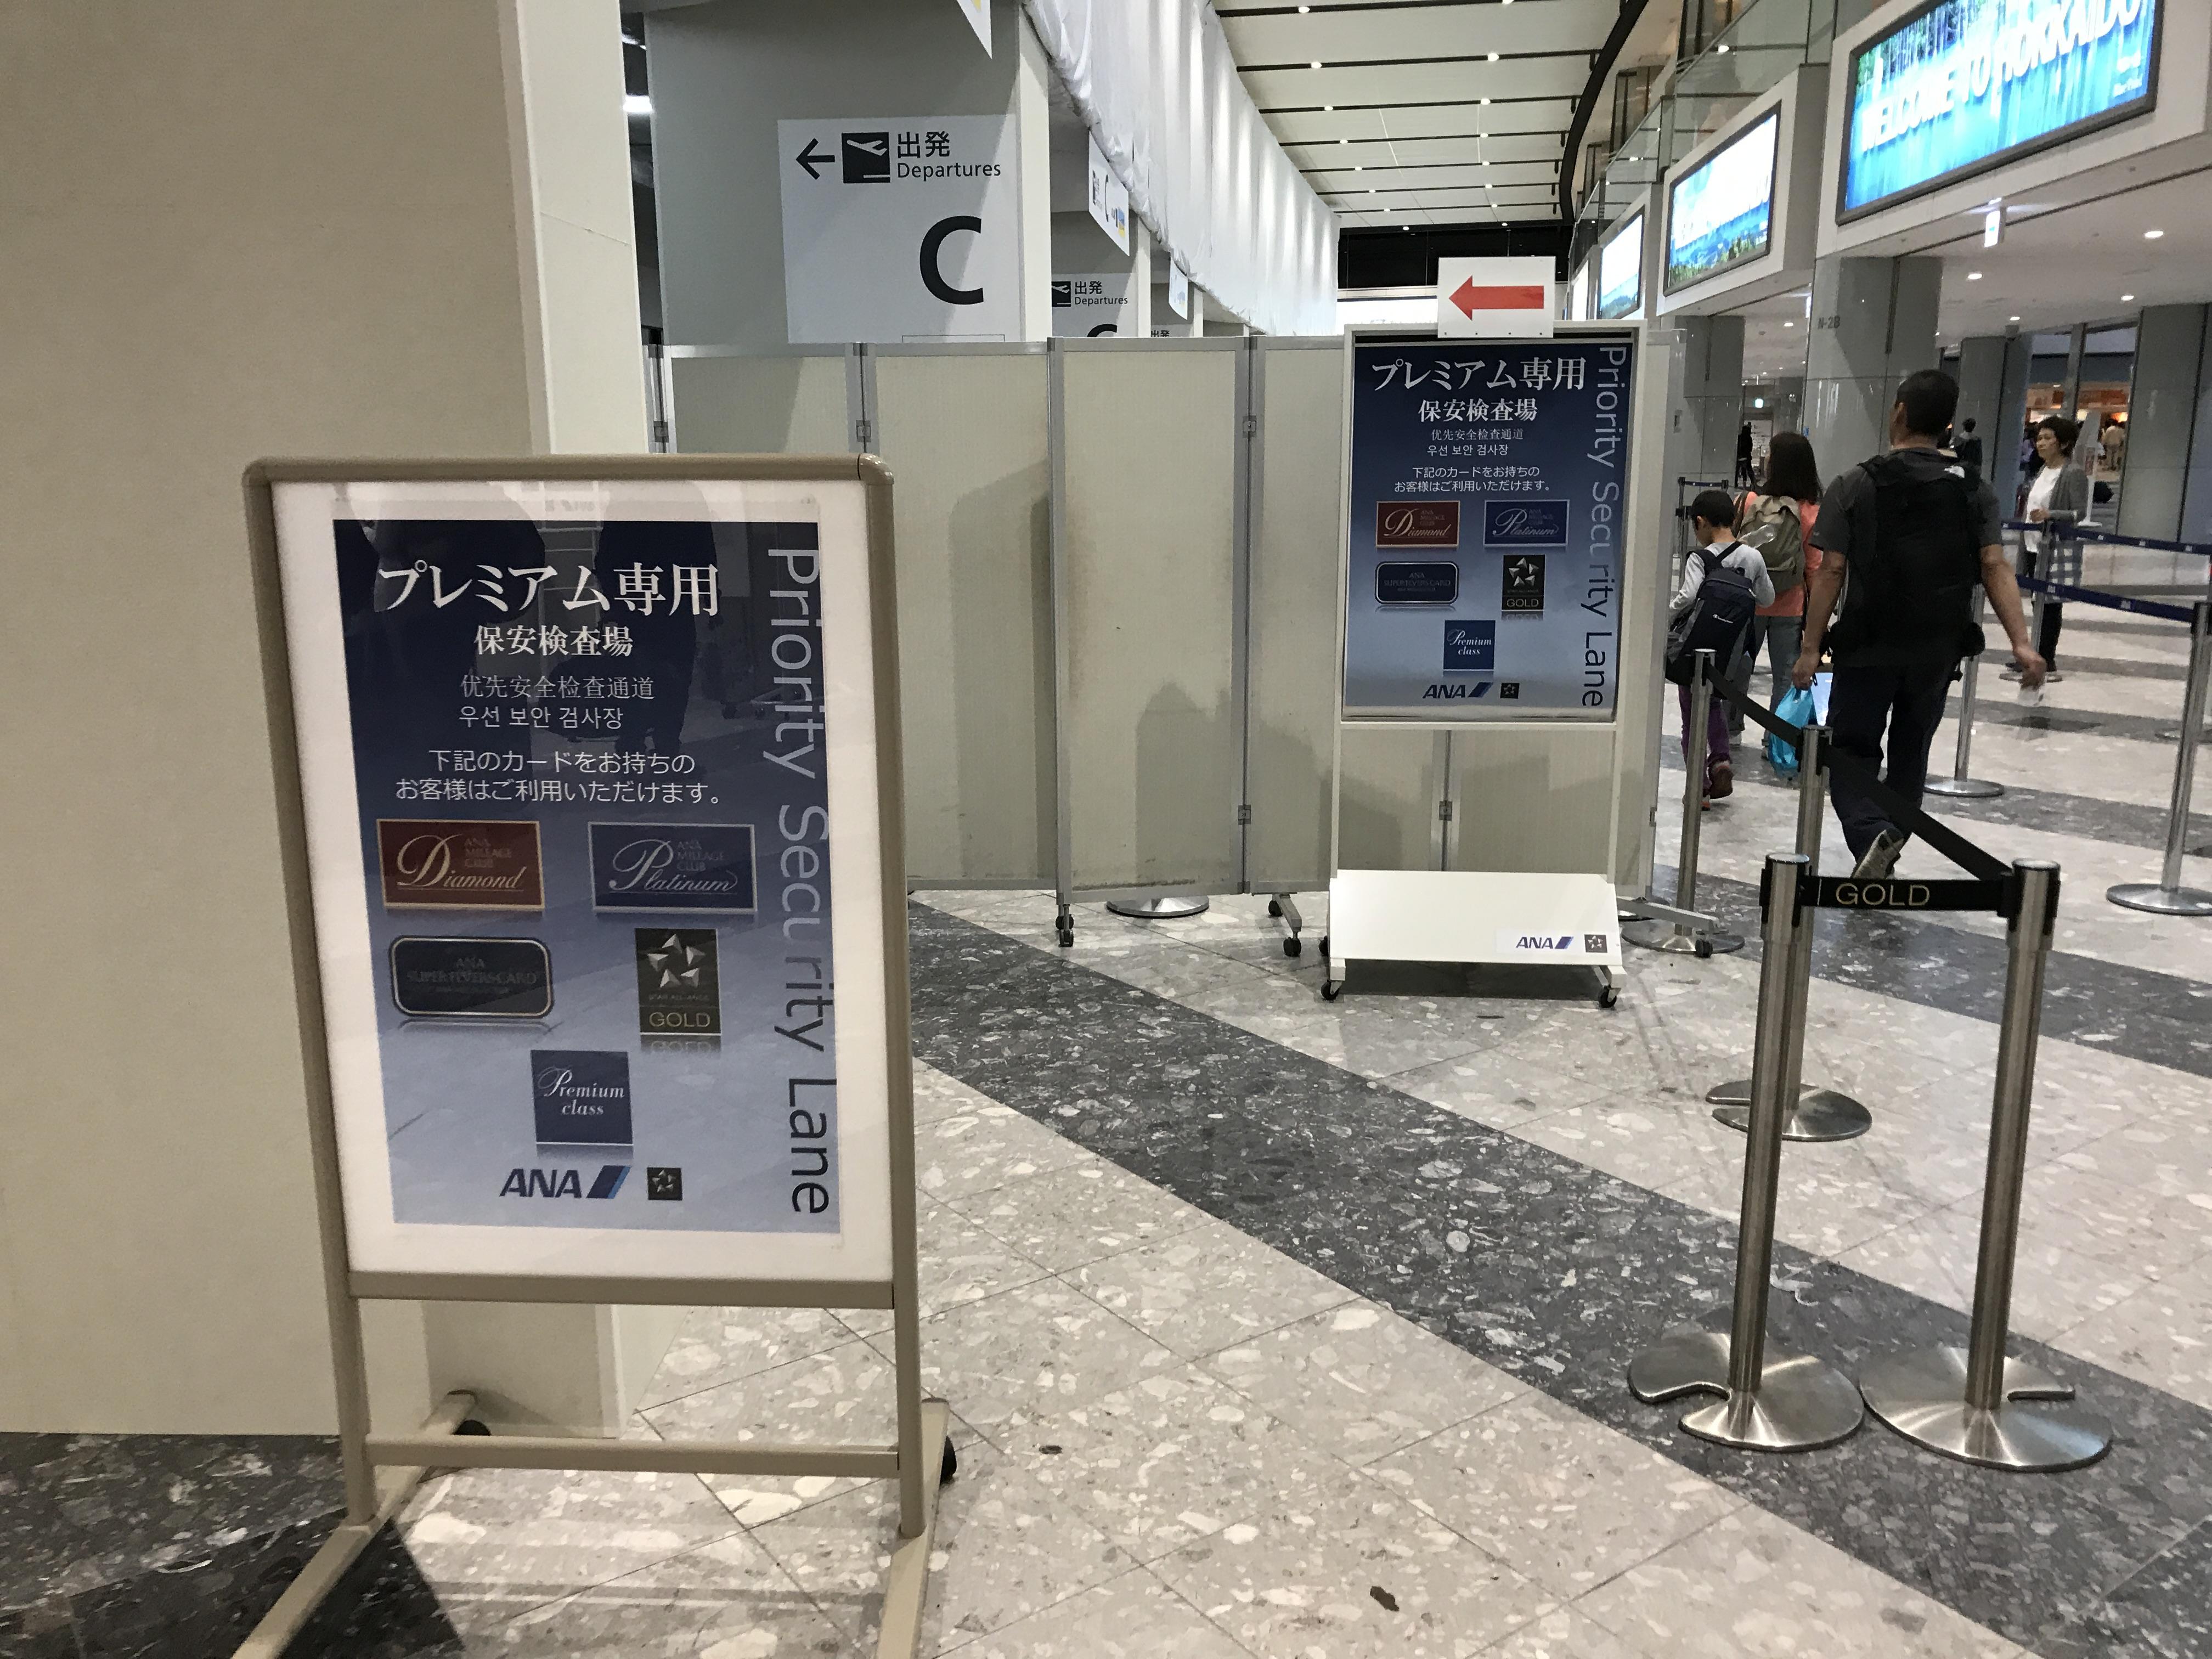 ANAラウンジ・上級会員優先出発口工事中の札幌・新千歳空港は、出発口Cに専用の優先検査場がある!